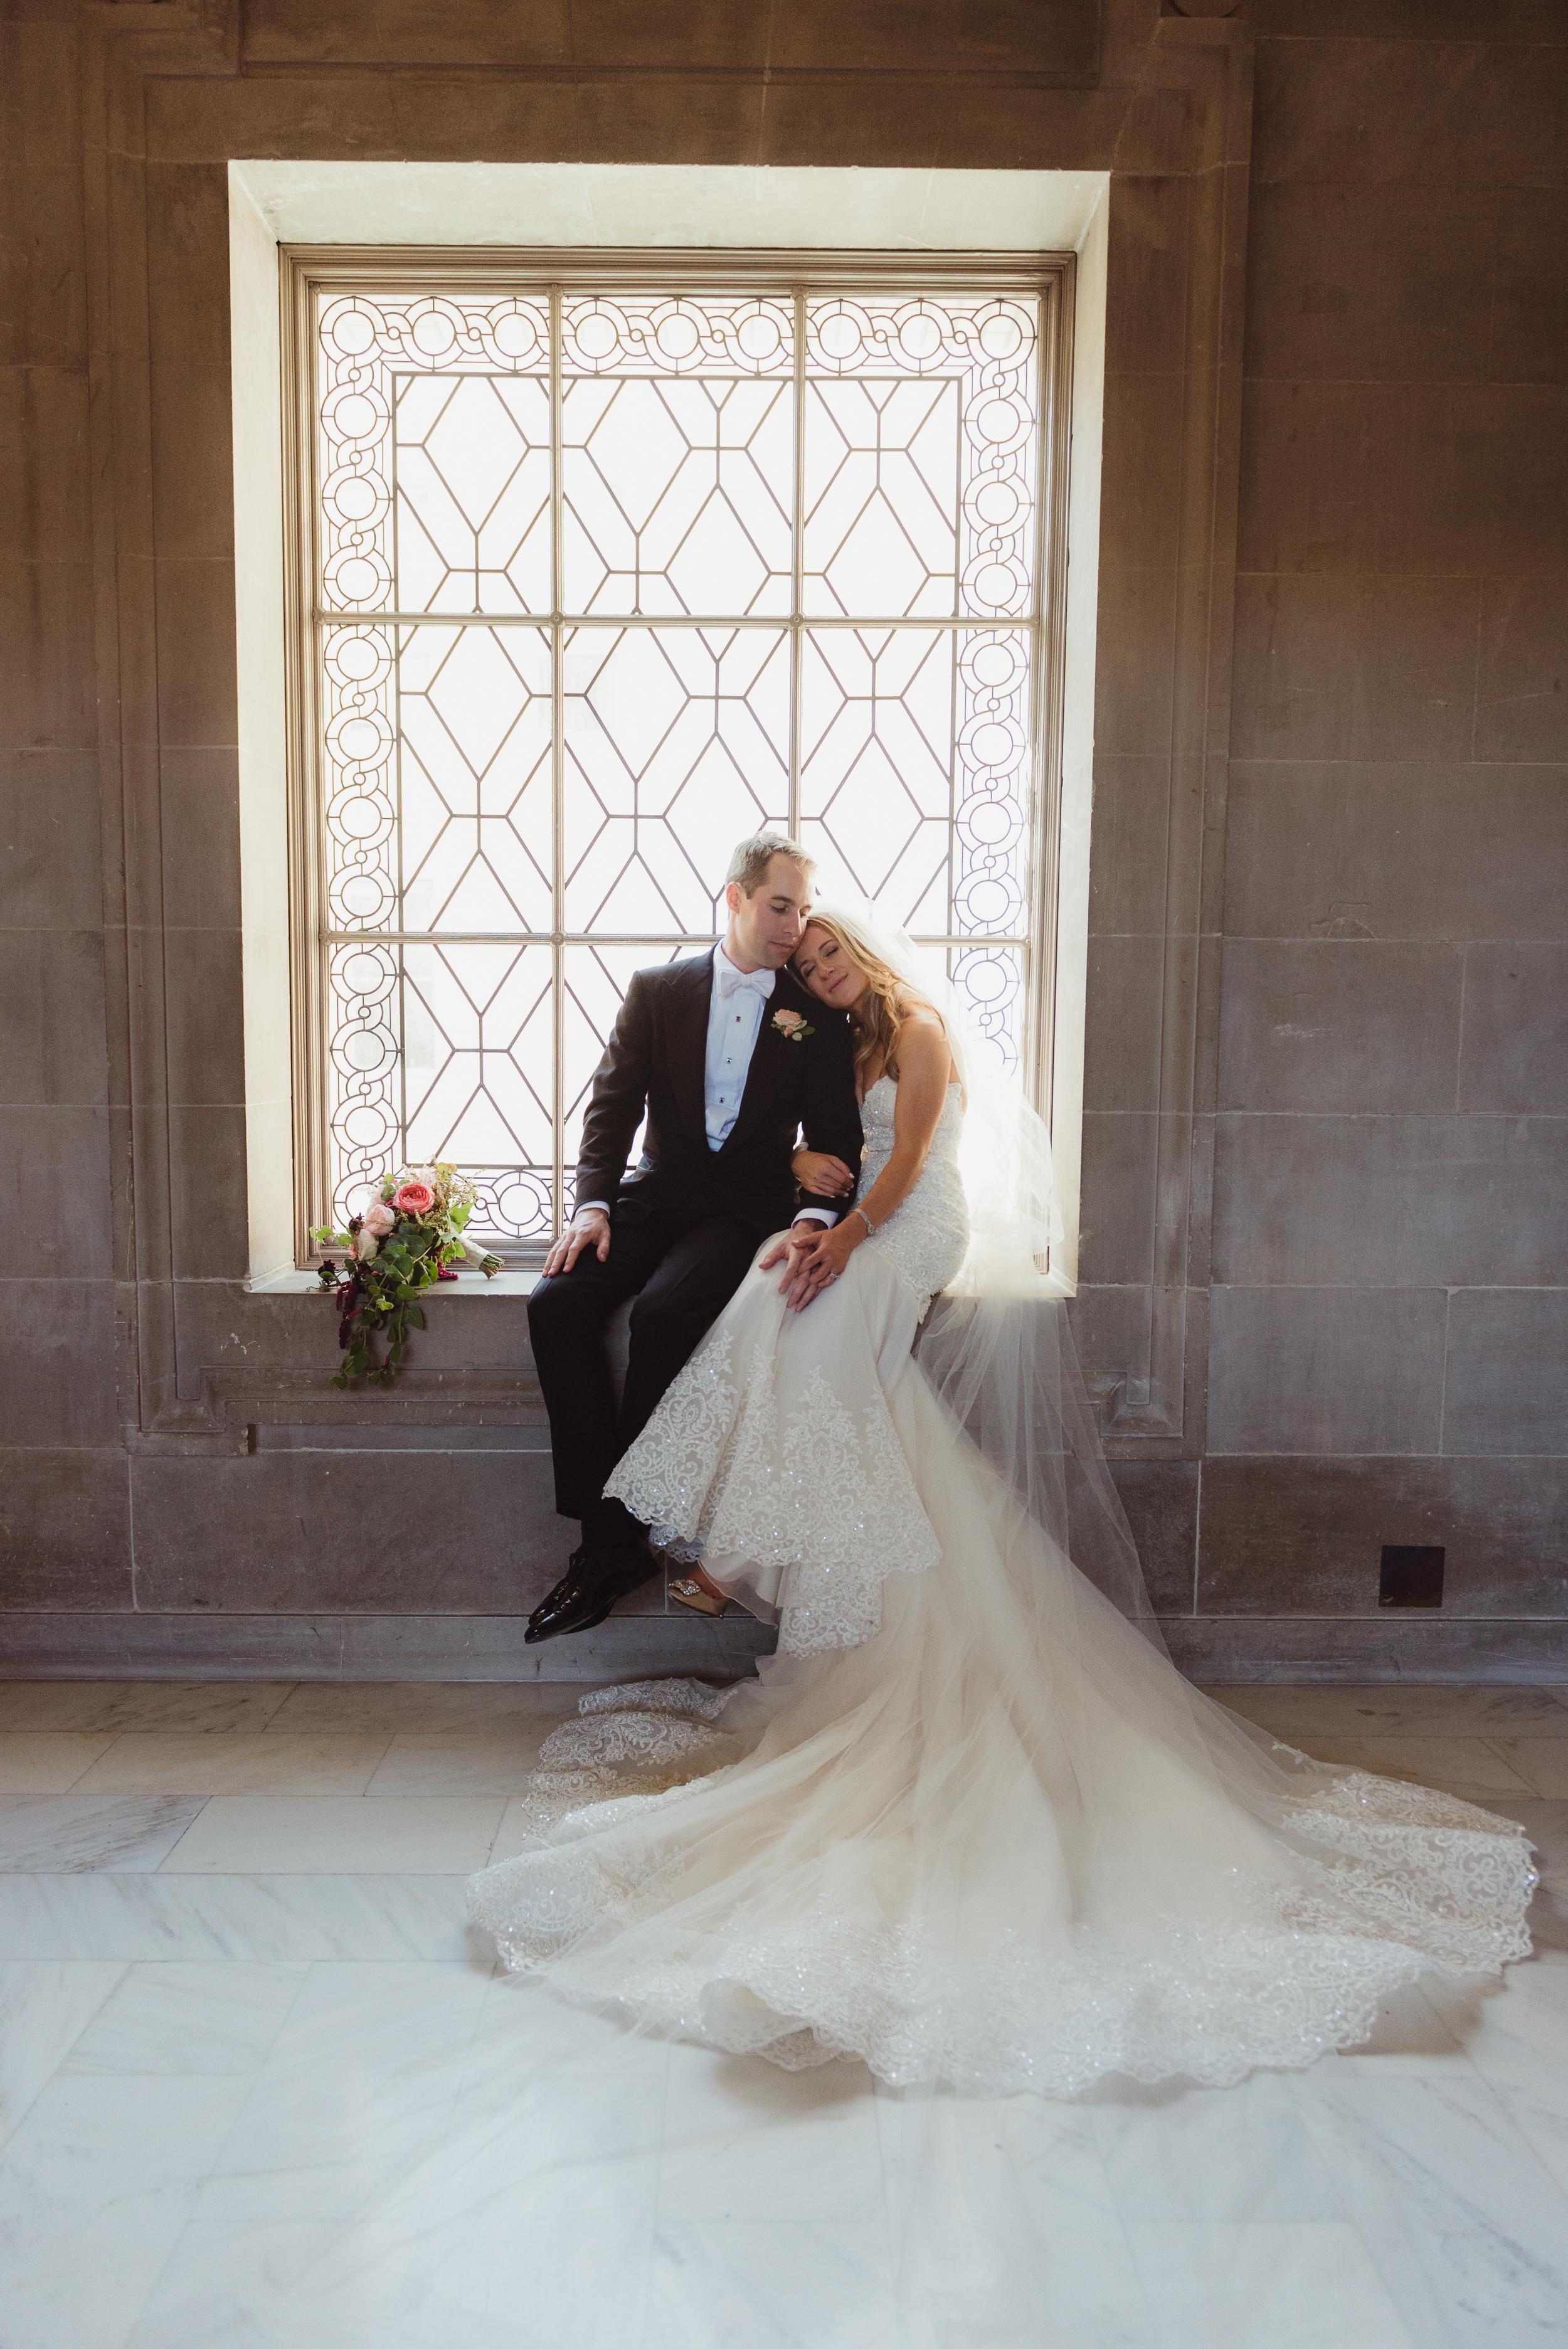 51-elegant-san-francisco-city-hall-wedding-vivianchen-0703.jpg